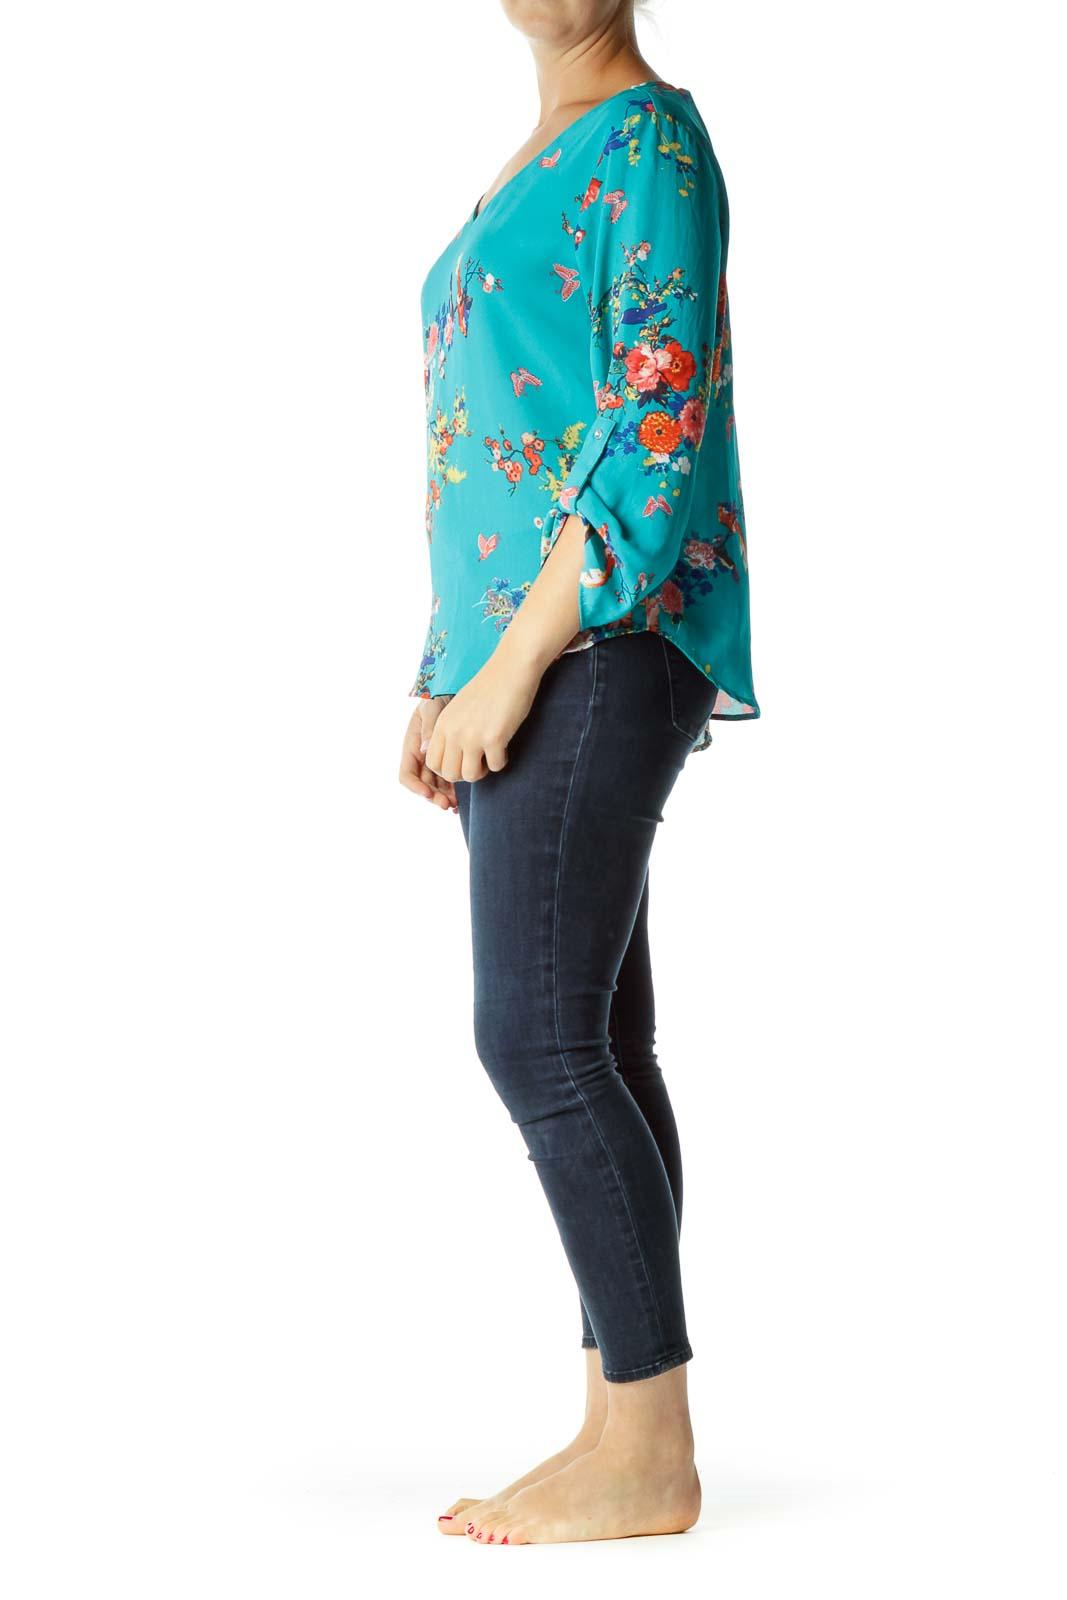 Blue Floral Print Long Sleeve Top